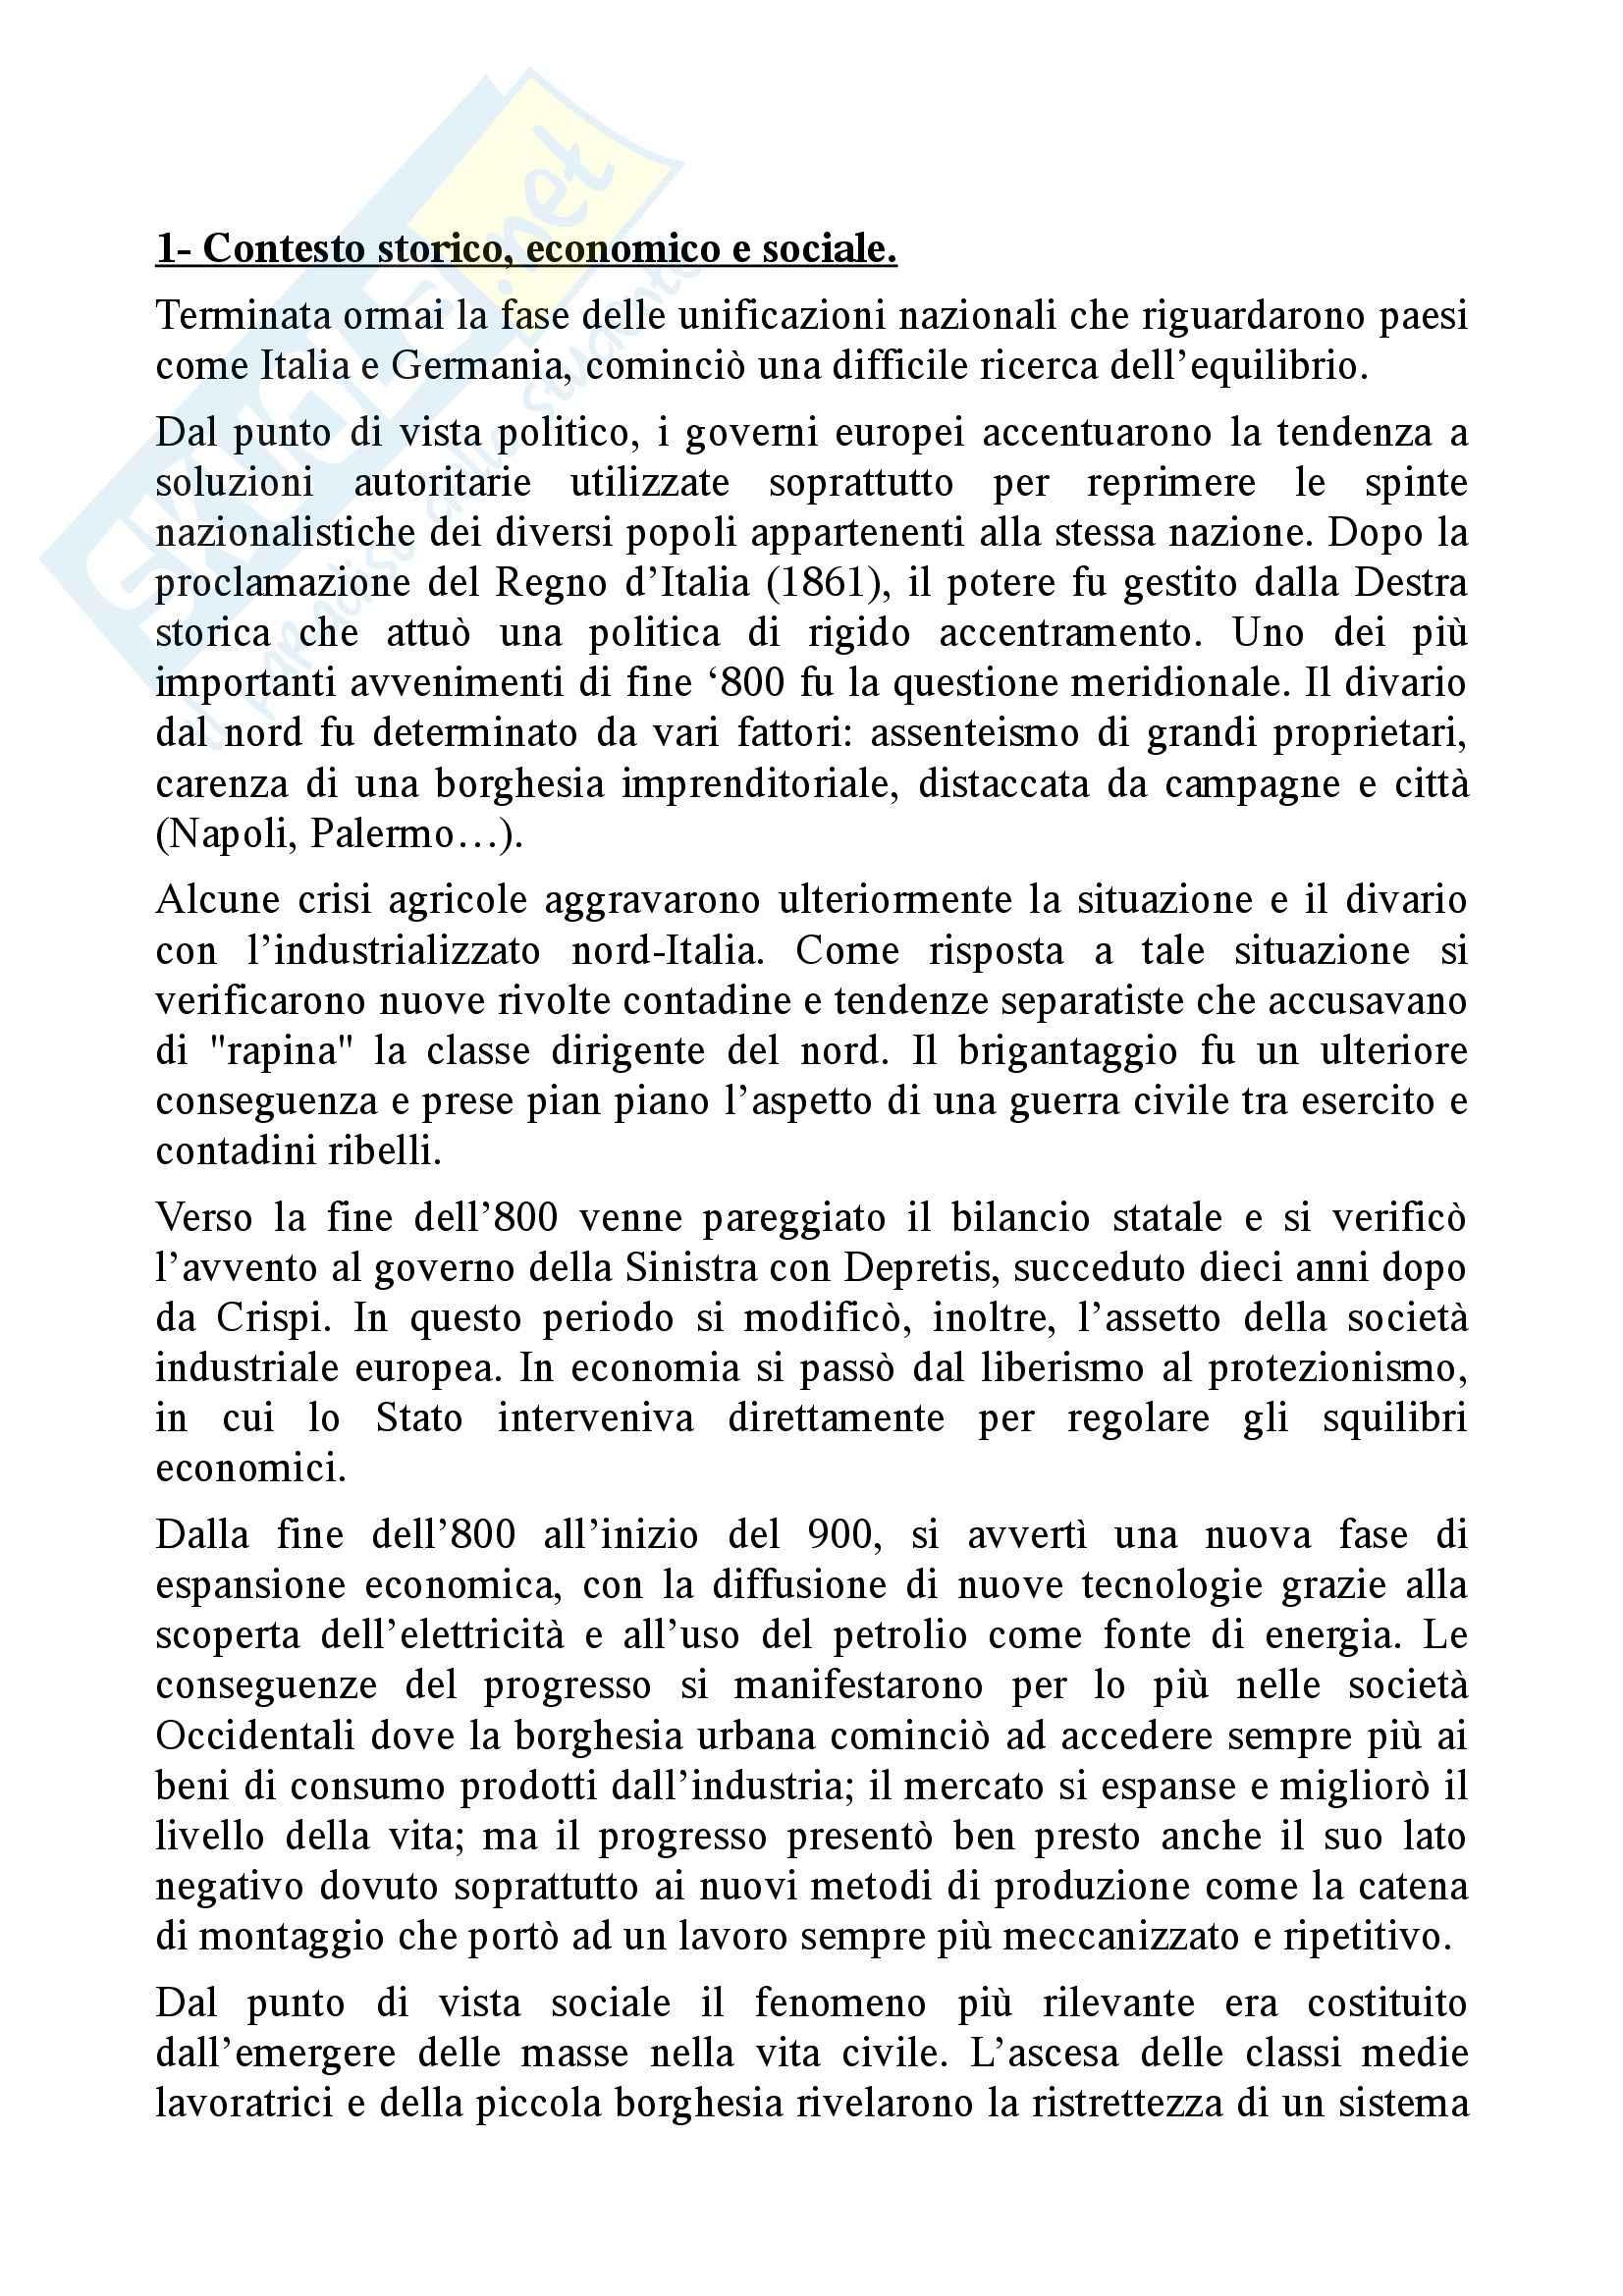 Letteratura Italiana - Verga appunti